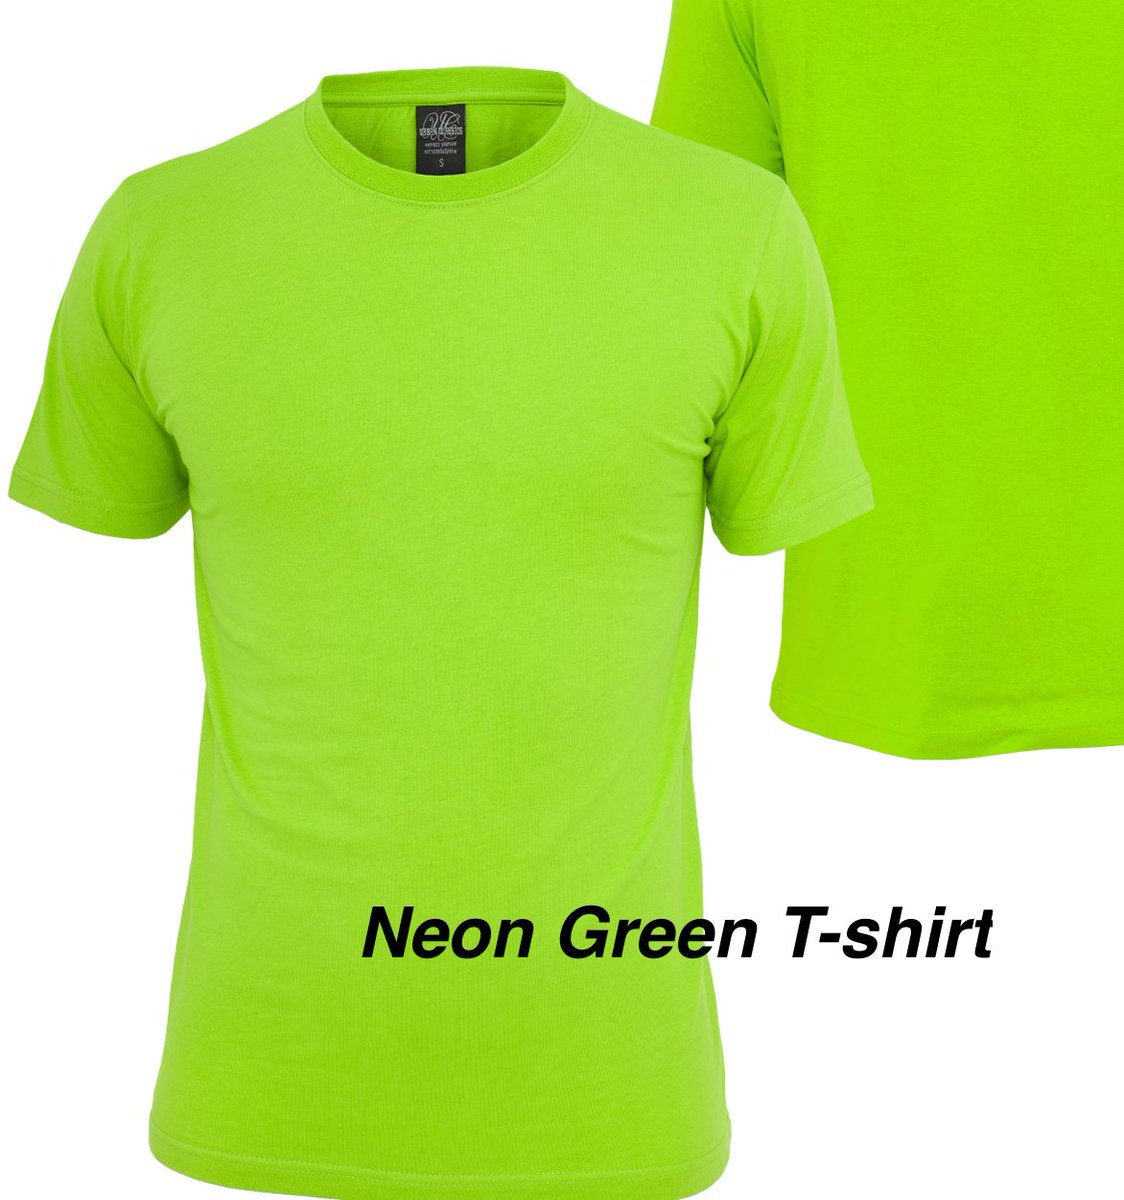 Uzivatel تعل م الإنجليزية معنا Na Twitteru الألوان الفسفورية الأقلام Highlighters هايلايترز أما غيرها نقول Neon مع اللون أخضر فسفوري Neon Green Nootshi Https T Co Aulidquctn